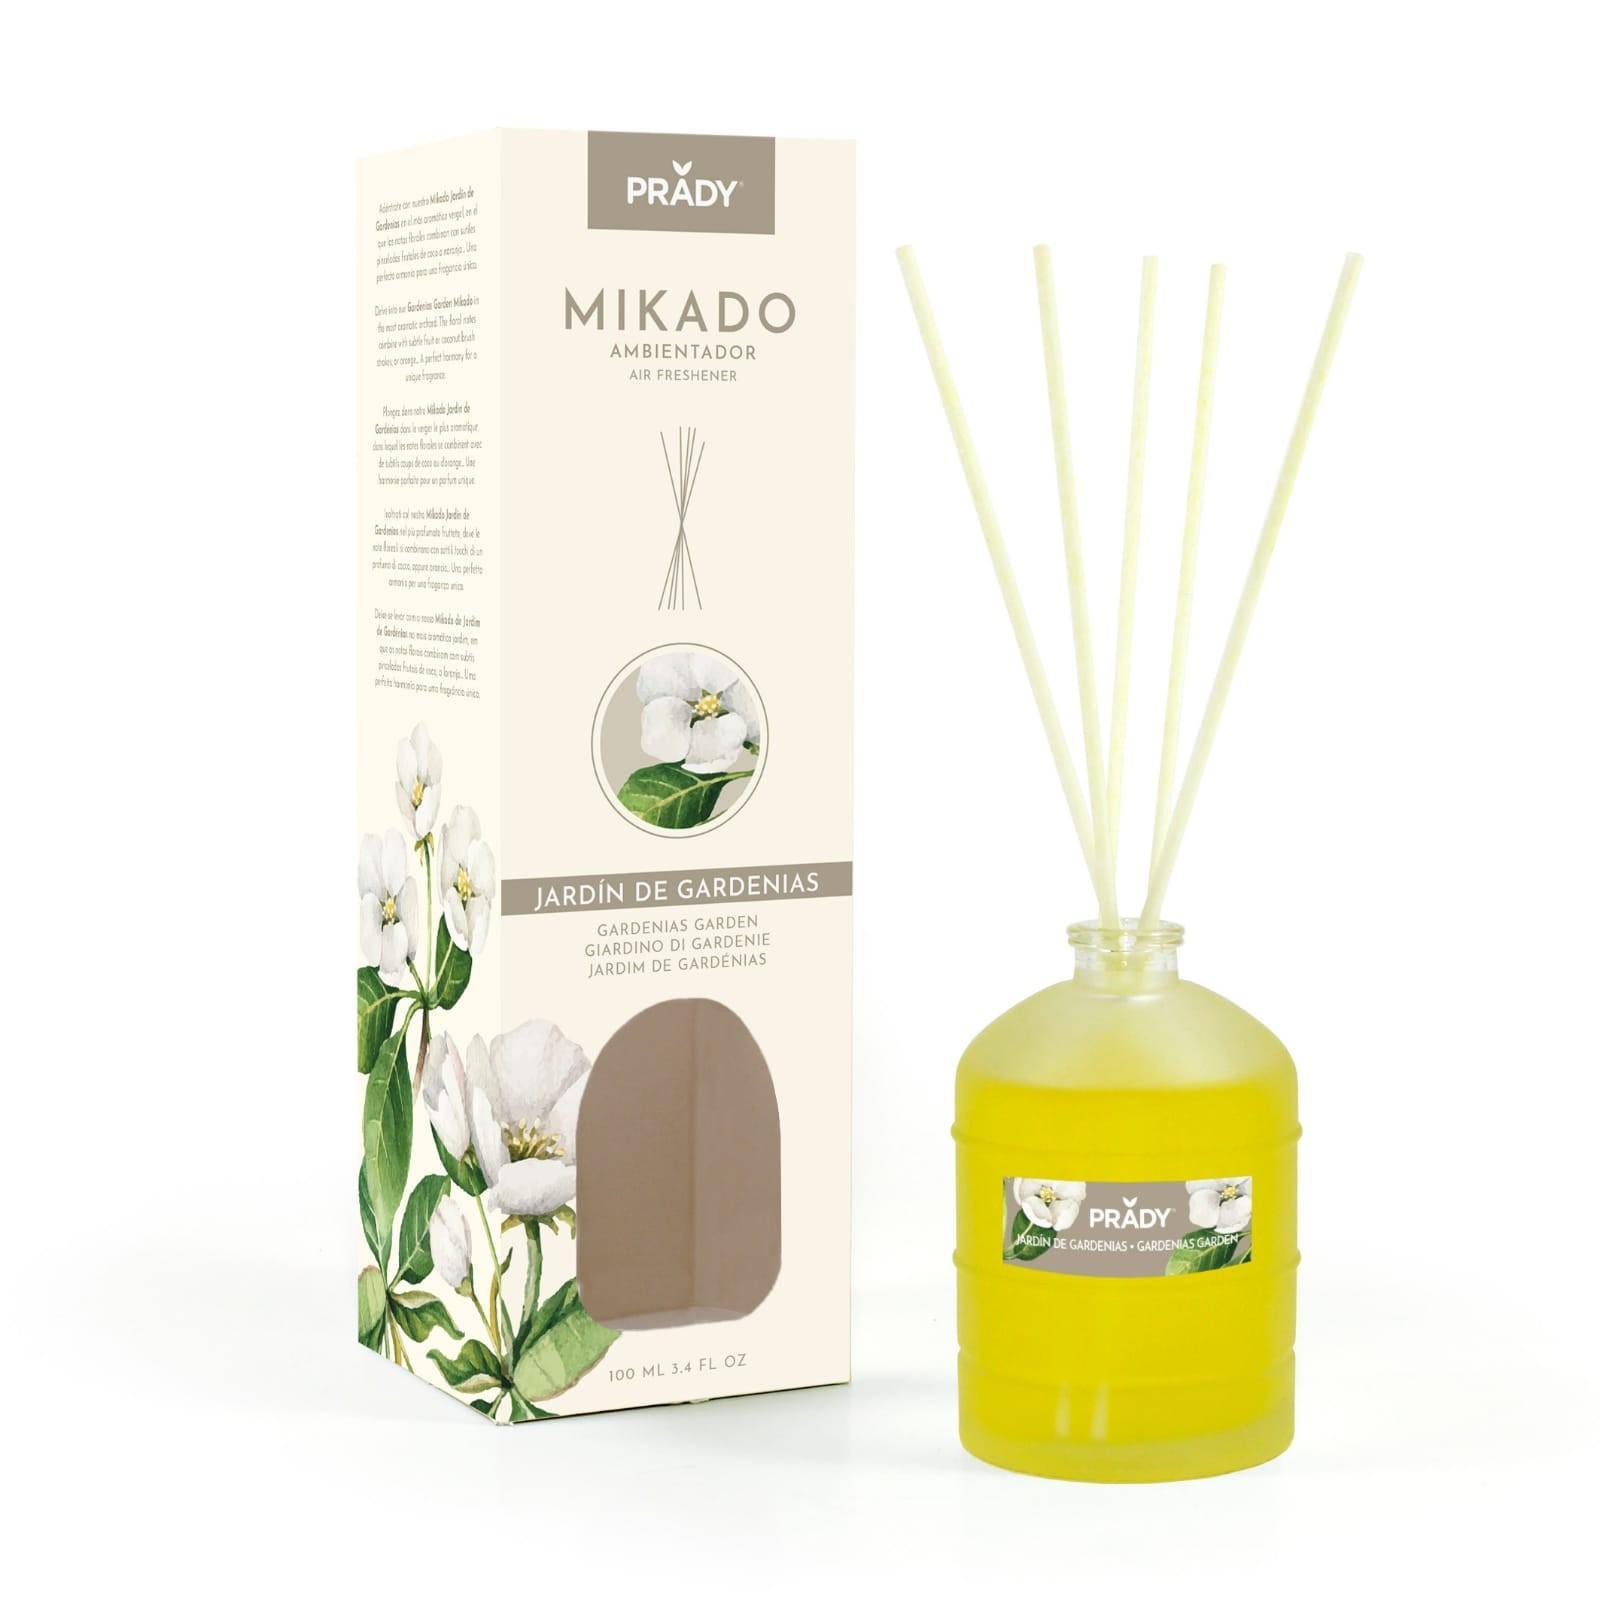 Ambientador Mikado Jardín de Gardenias Prady 100 ml.